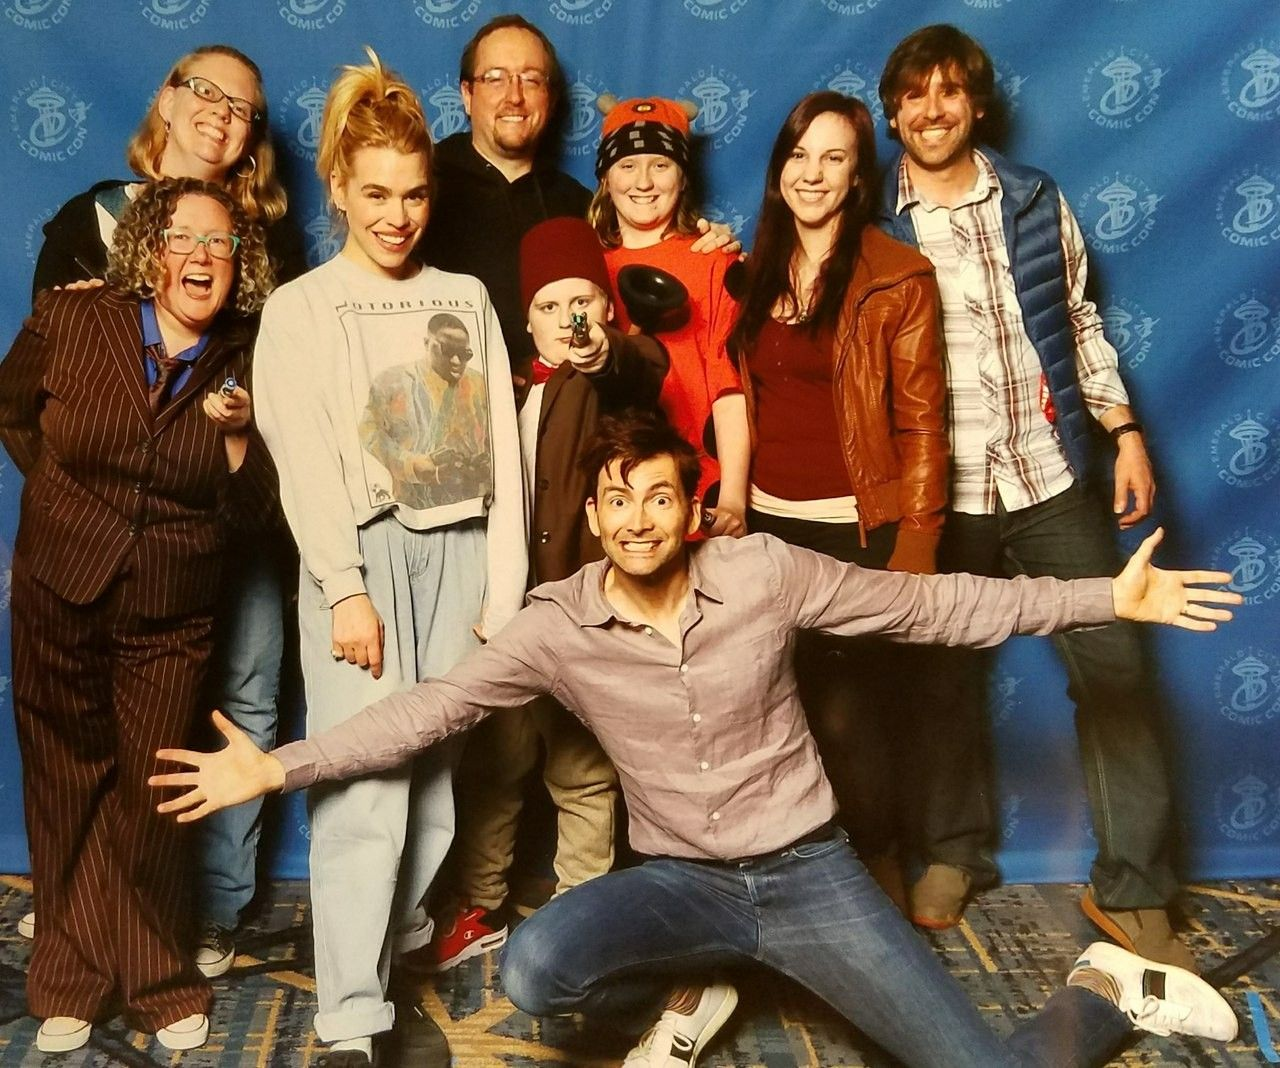 Billie Piper (Rose) & David Tennant (Tenth Doctor